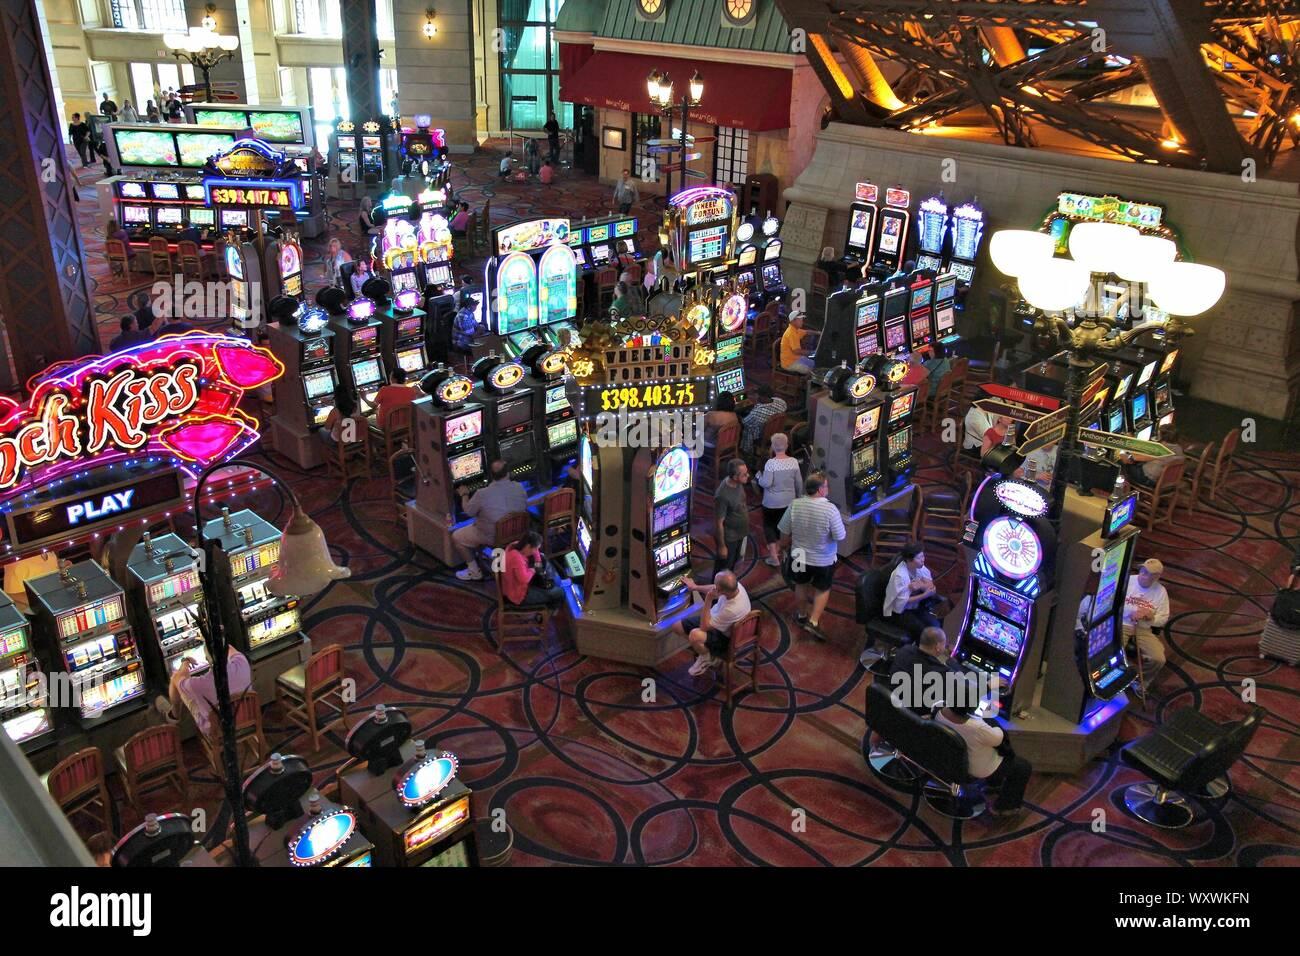 Las Vegas Usa April 14 2014 People Play Games At Paris Las